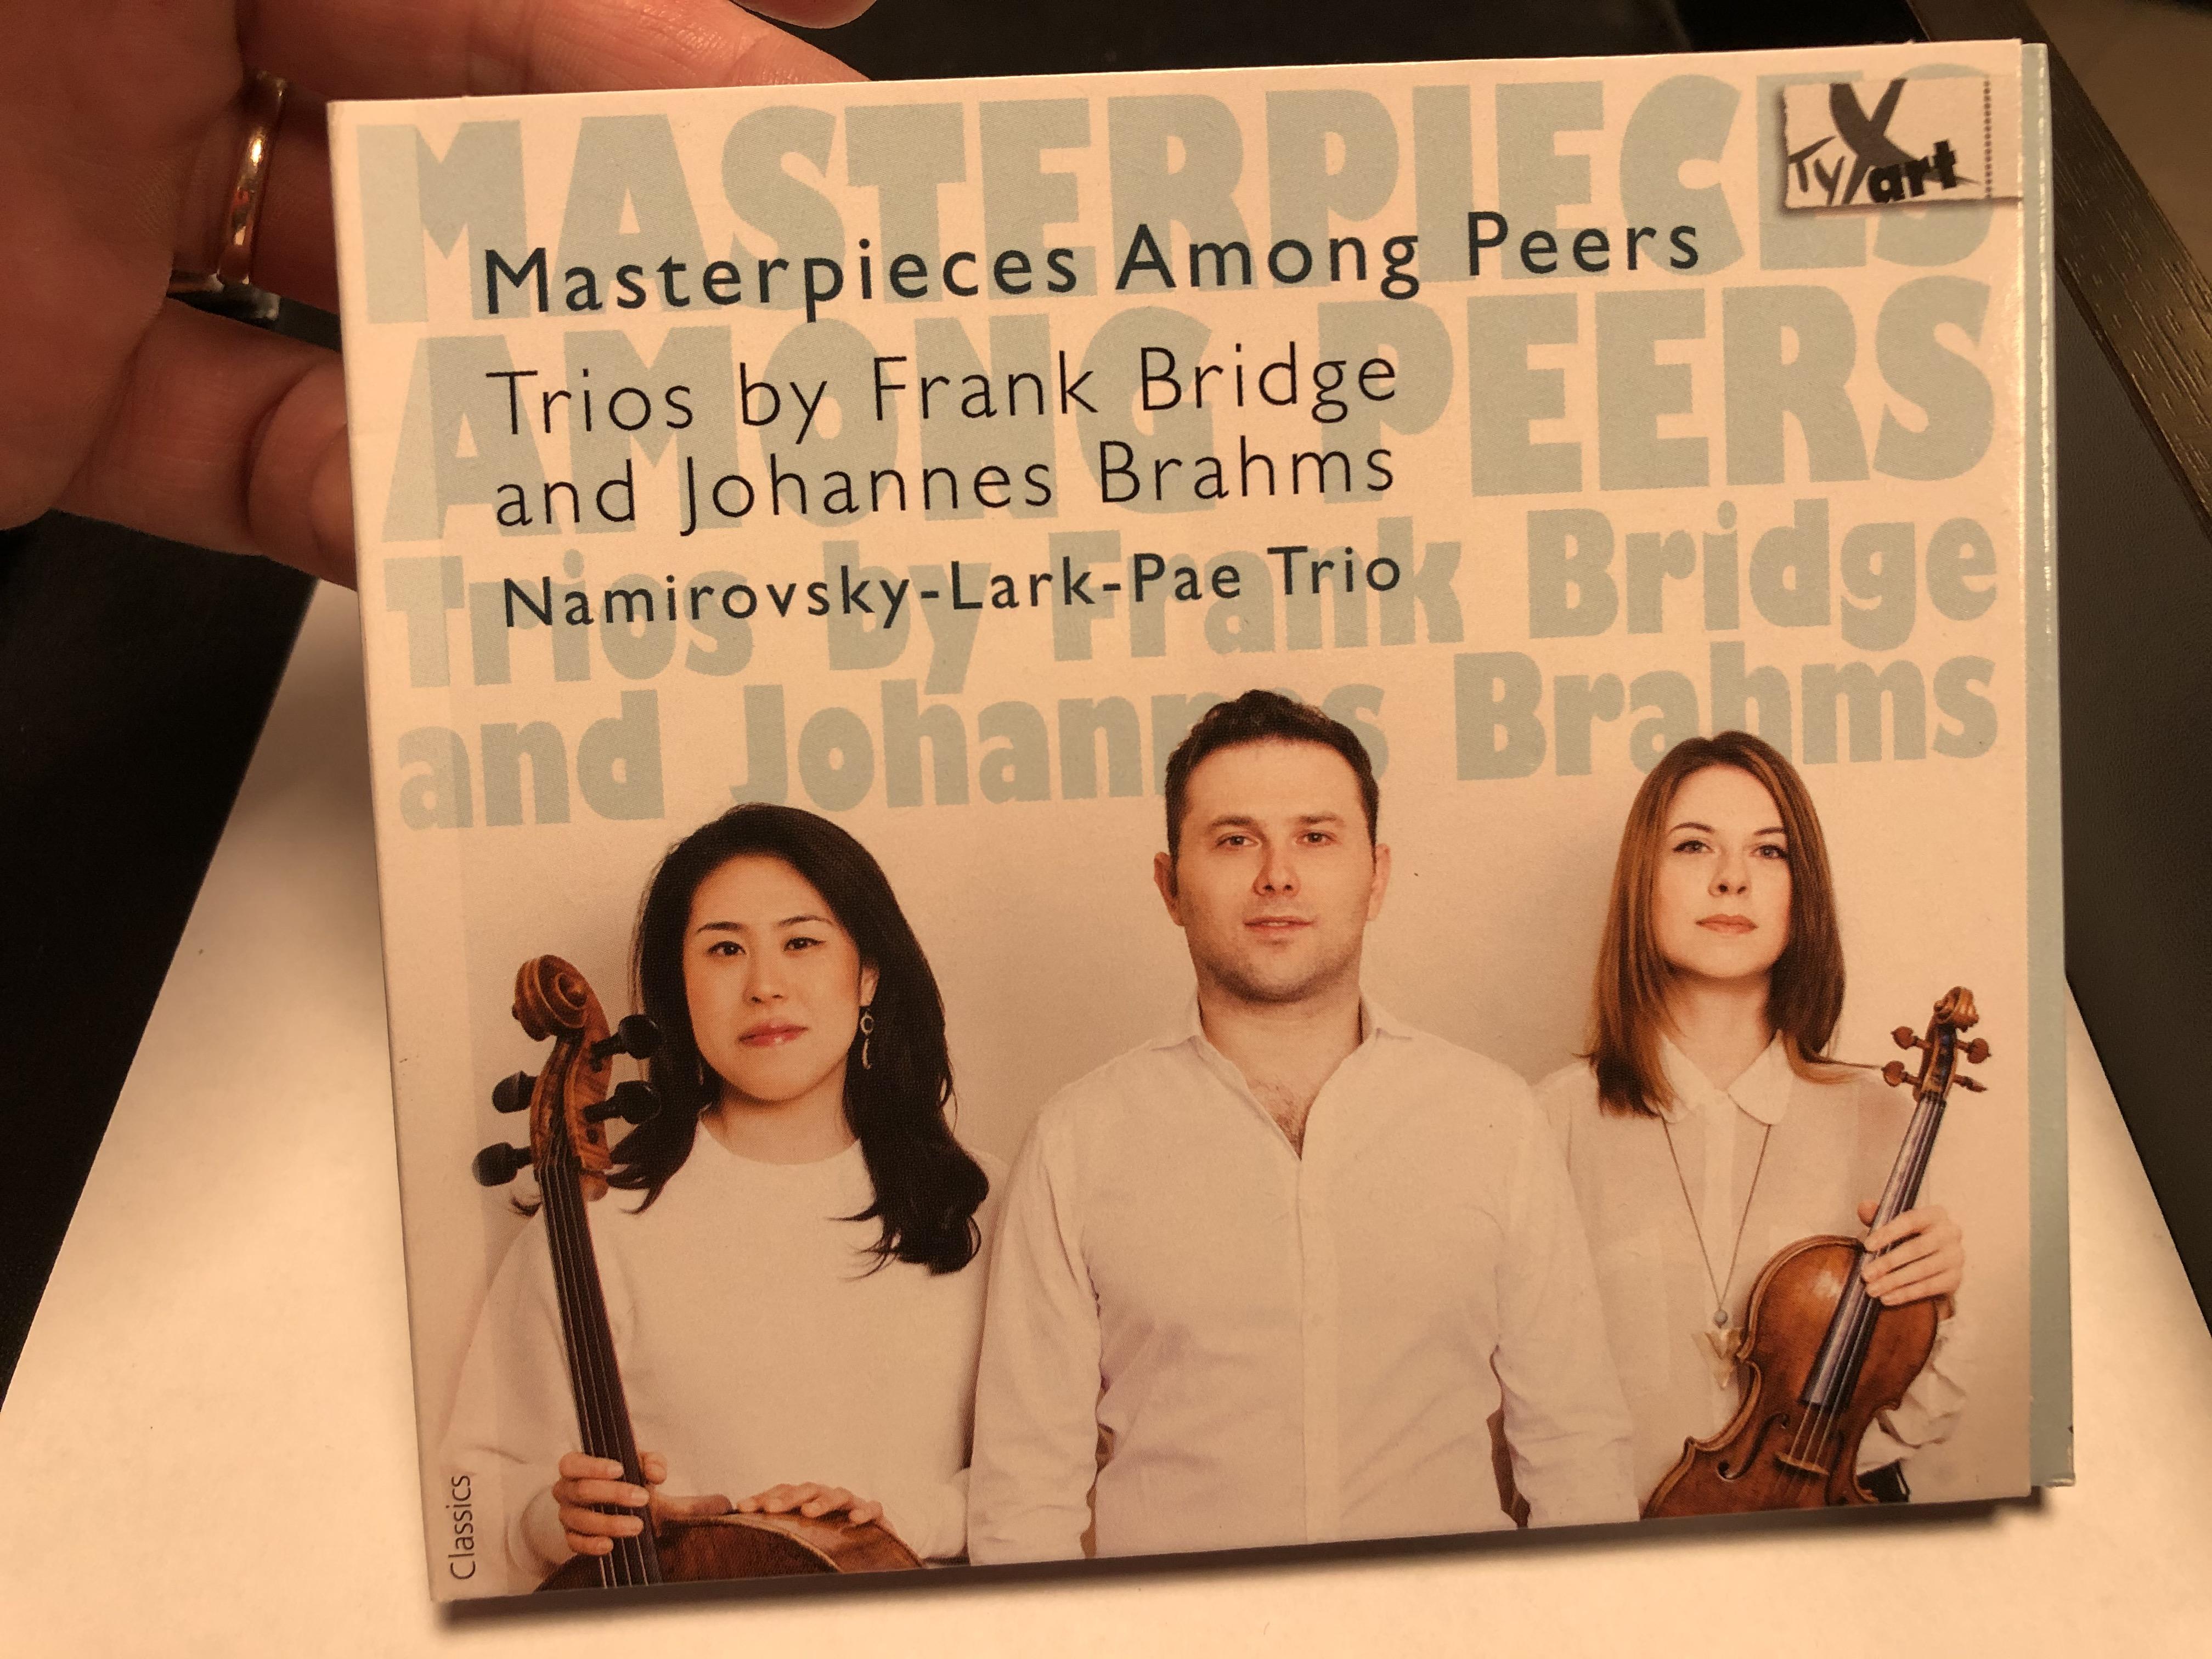 materpieces-among-peers-trios-by-frank-bridge-and-johannes-brahms-namirovsky-lark-pae-trio-tyxart-audio-cd-2020-txa18104-1-.jpg